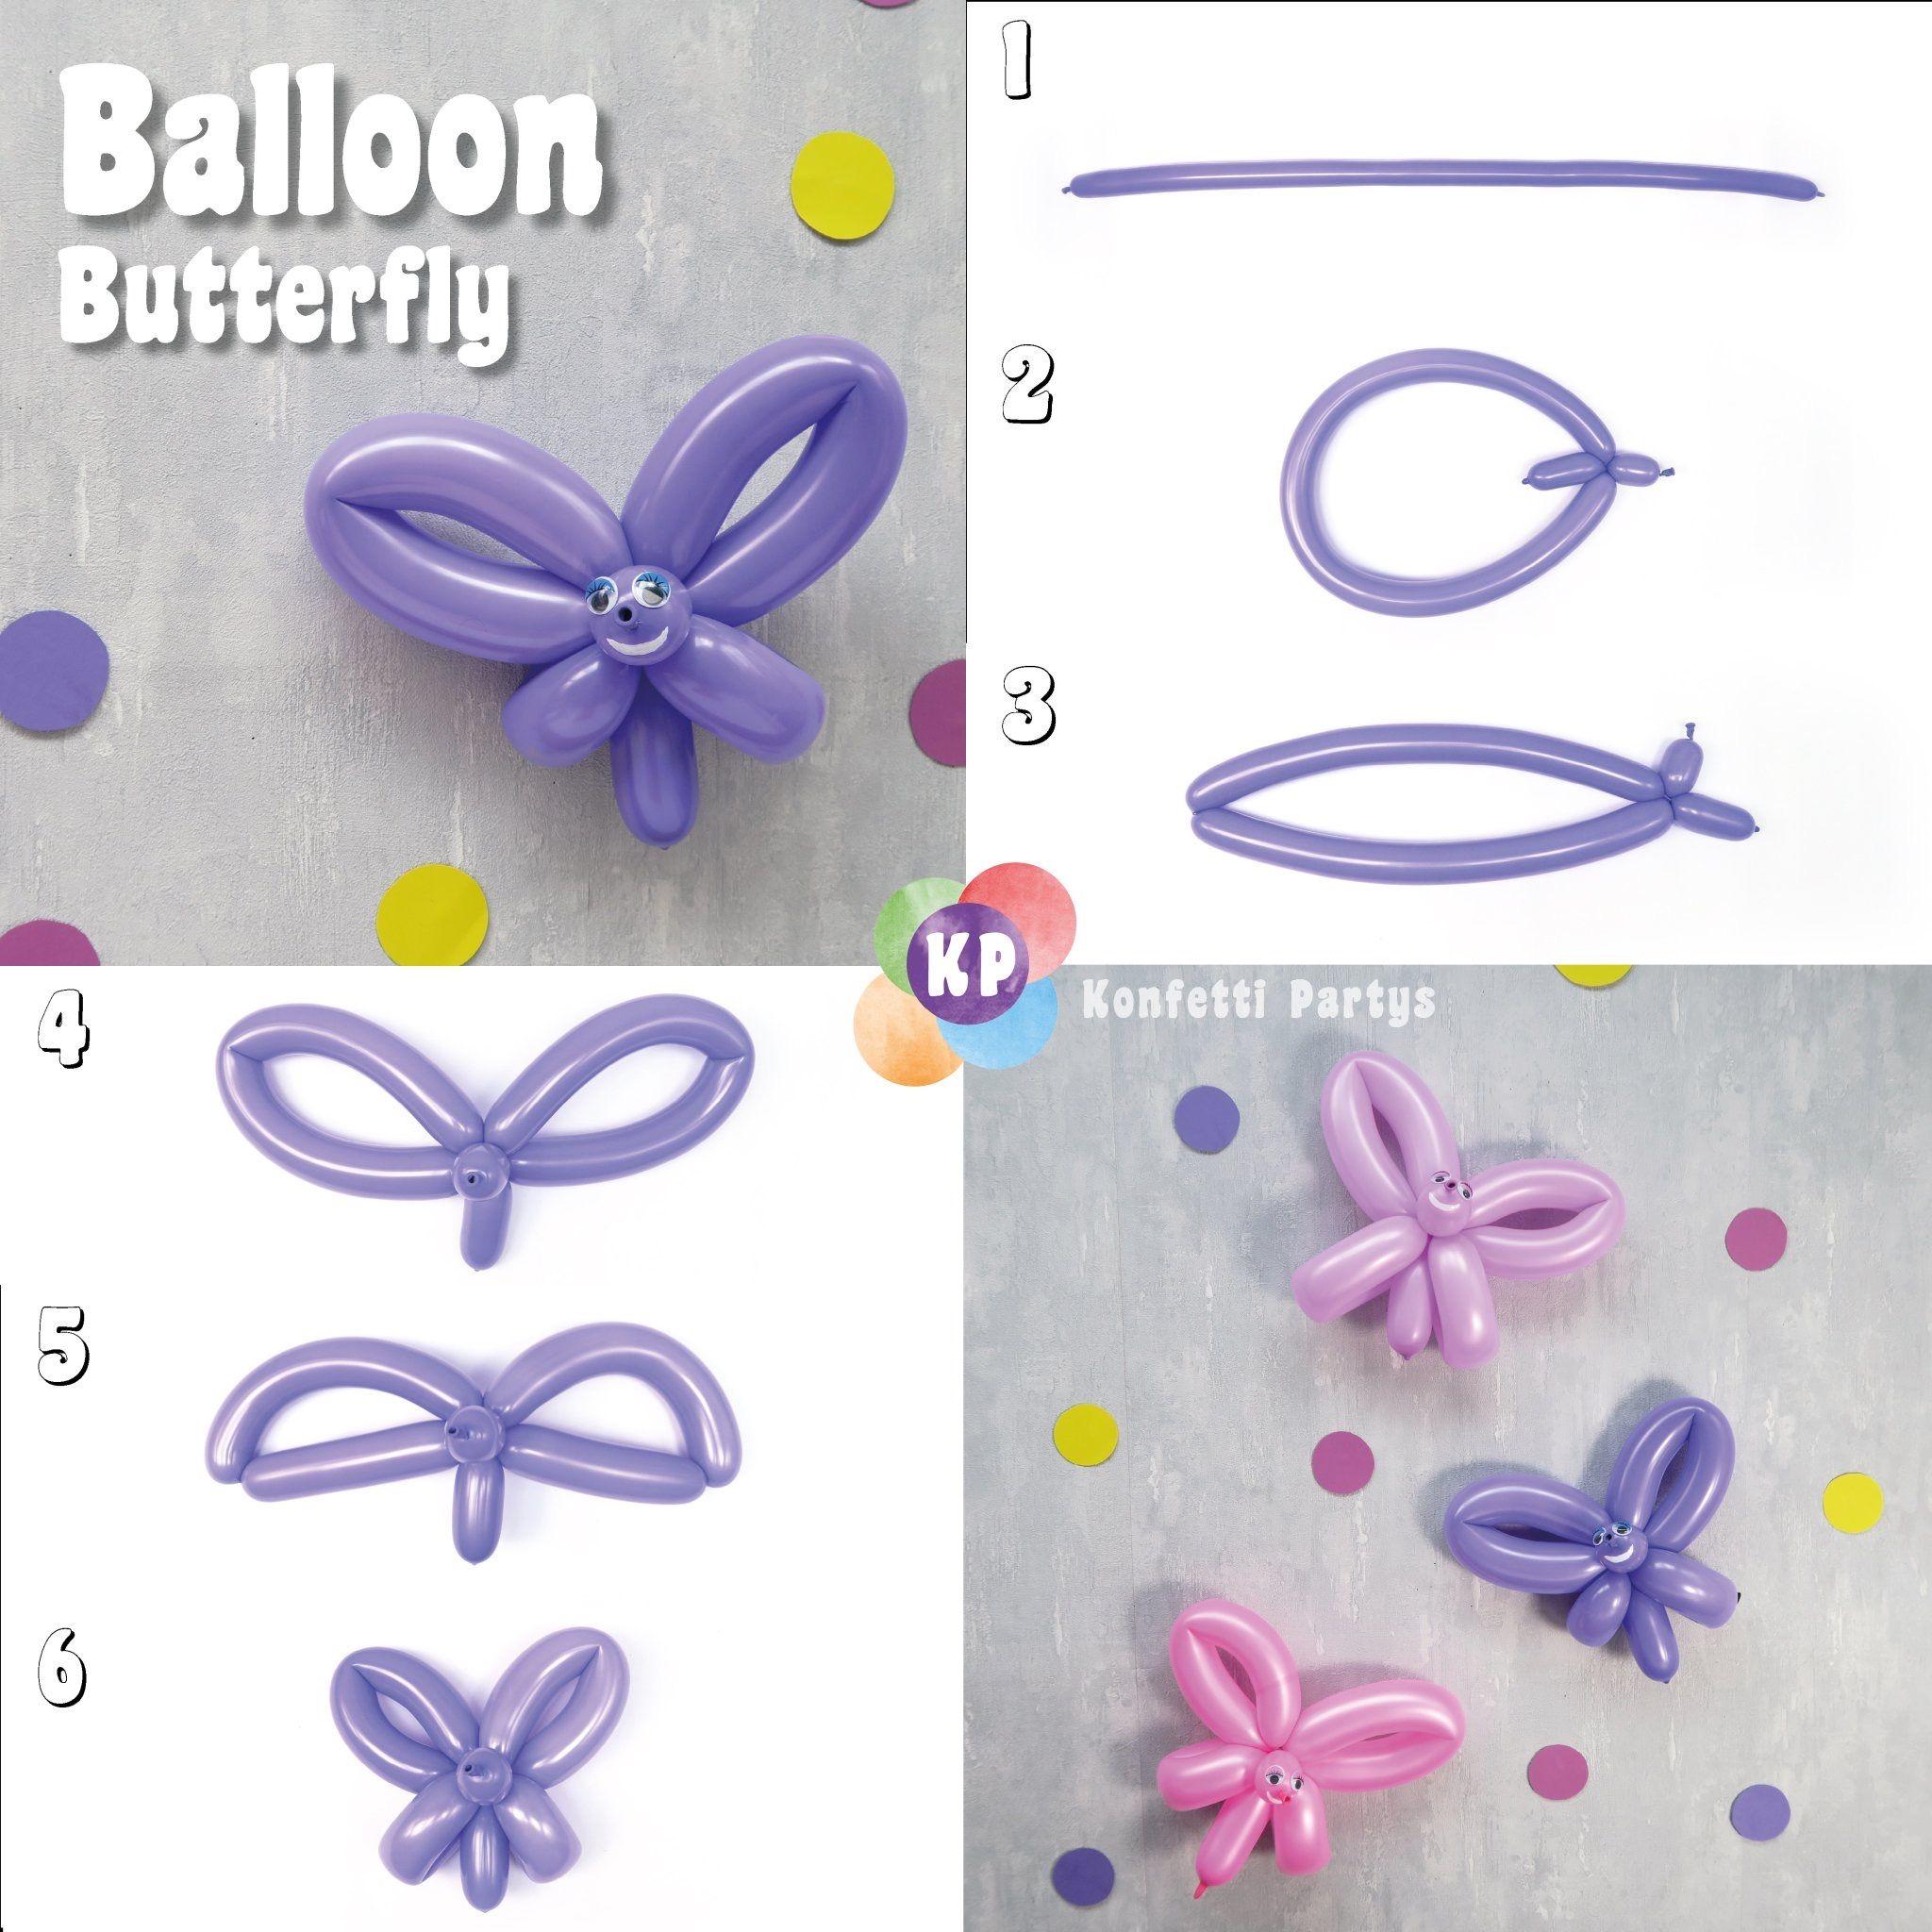 Extrem Butterfly Balloon DIY Schmetterling Ballon selber machen US11